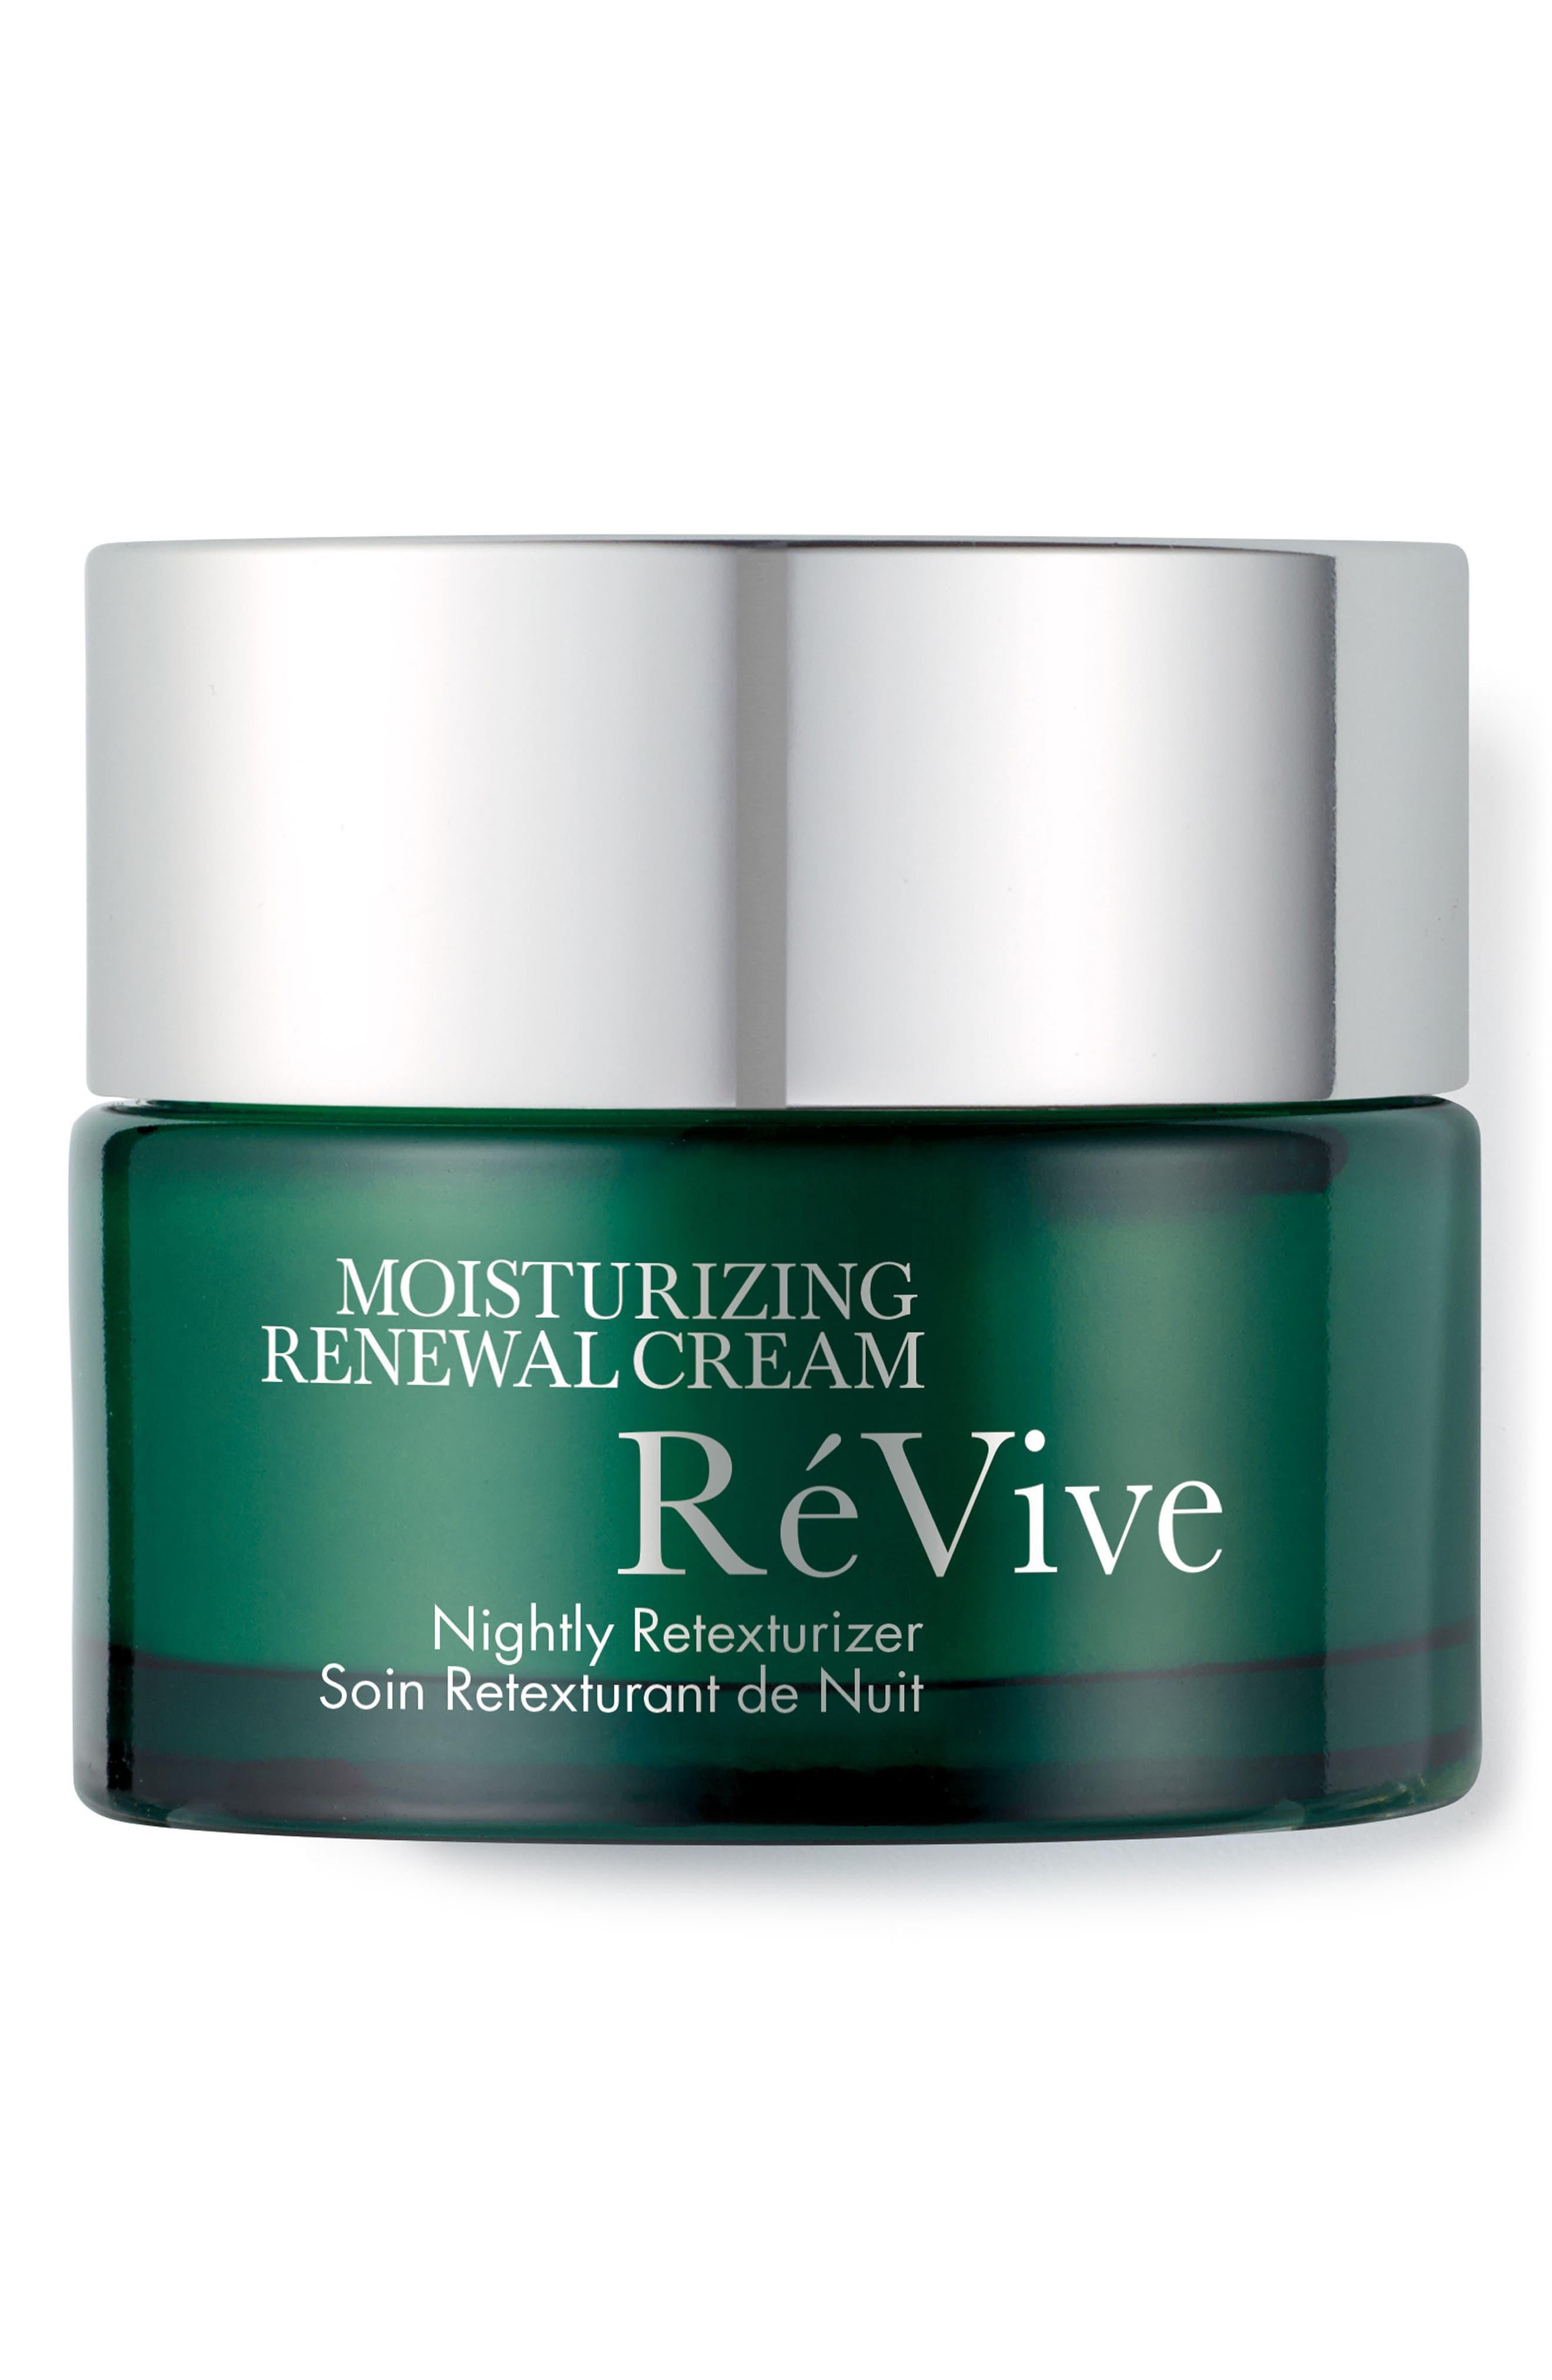 Moisturizing Renewal Cream,                             Main thumbnail 1, color,                             No Color